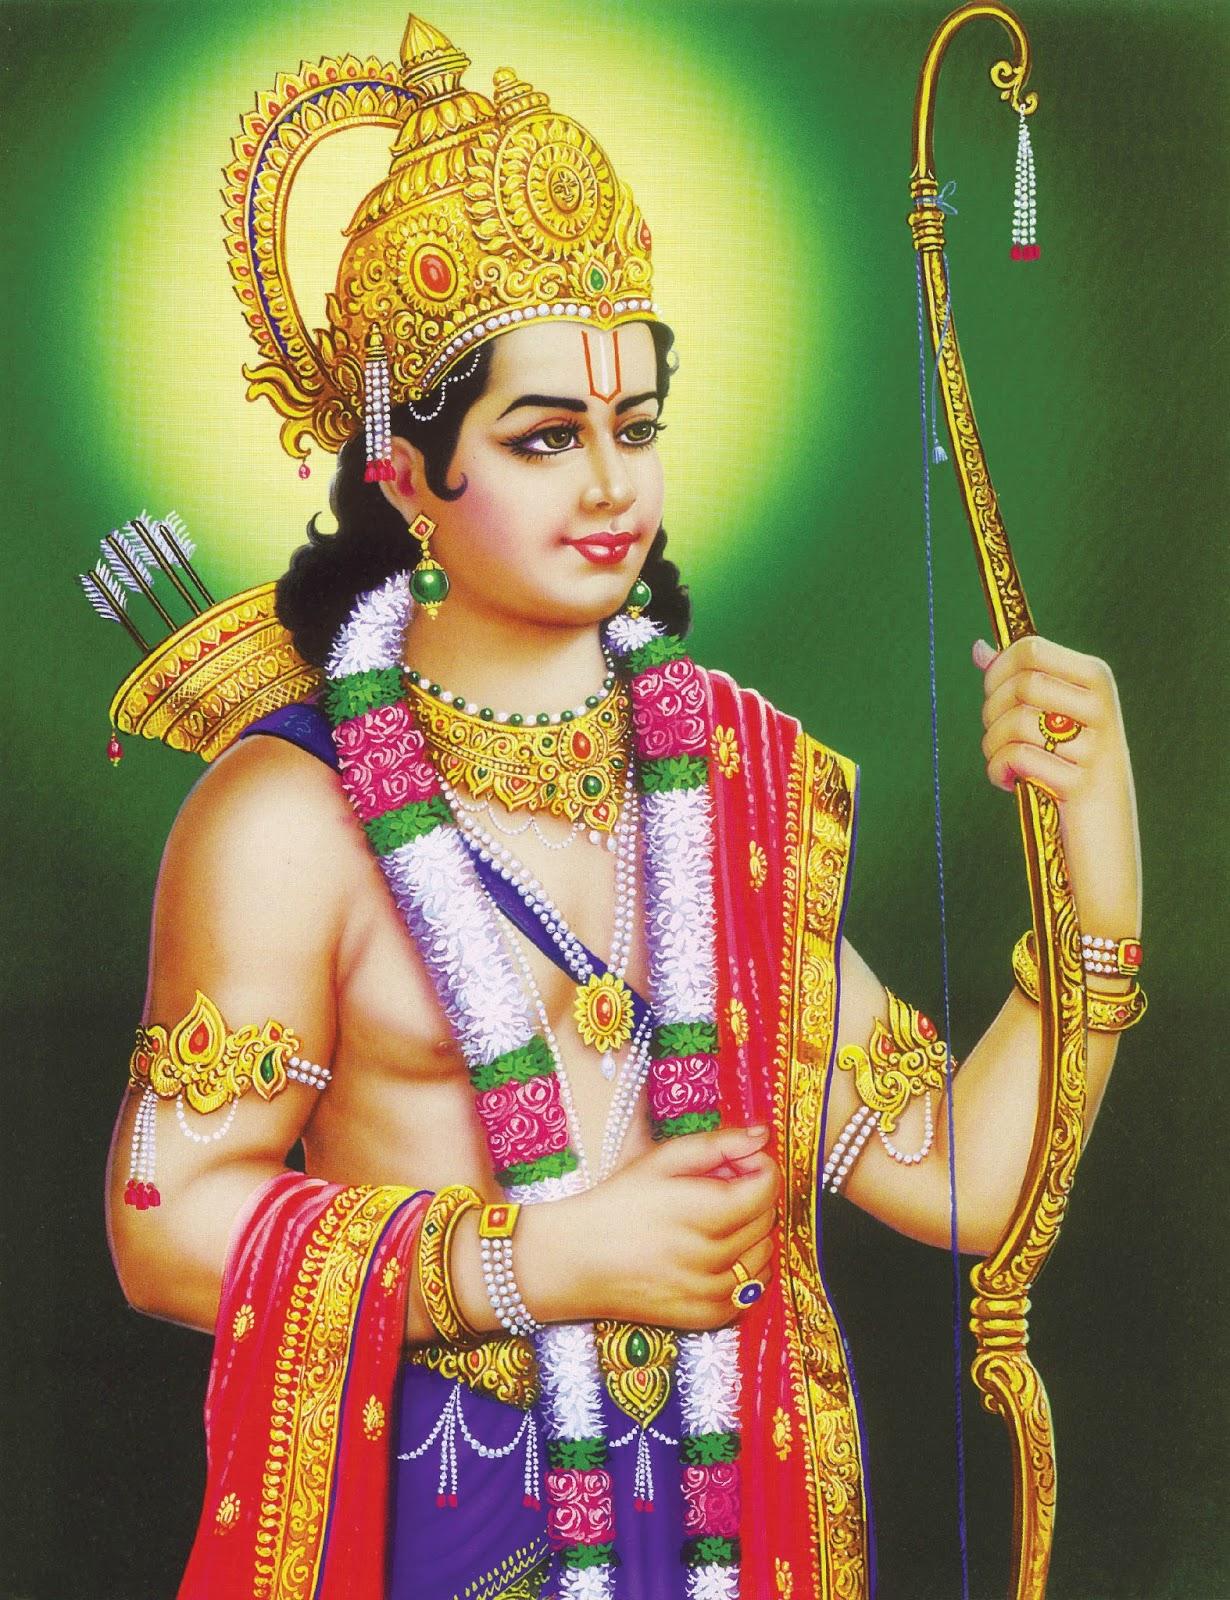 Cool Wallpaper Lord Mahavishnu - lord+vishnu5  Collection_374848.jpg